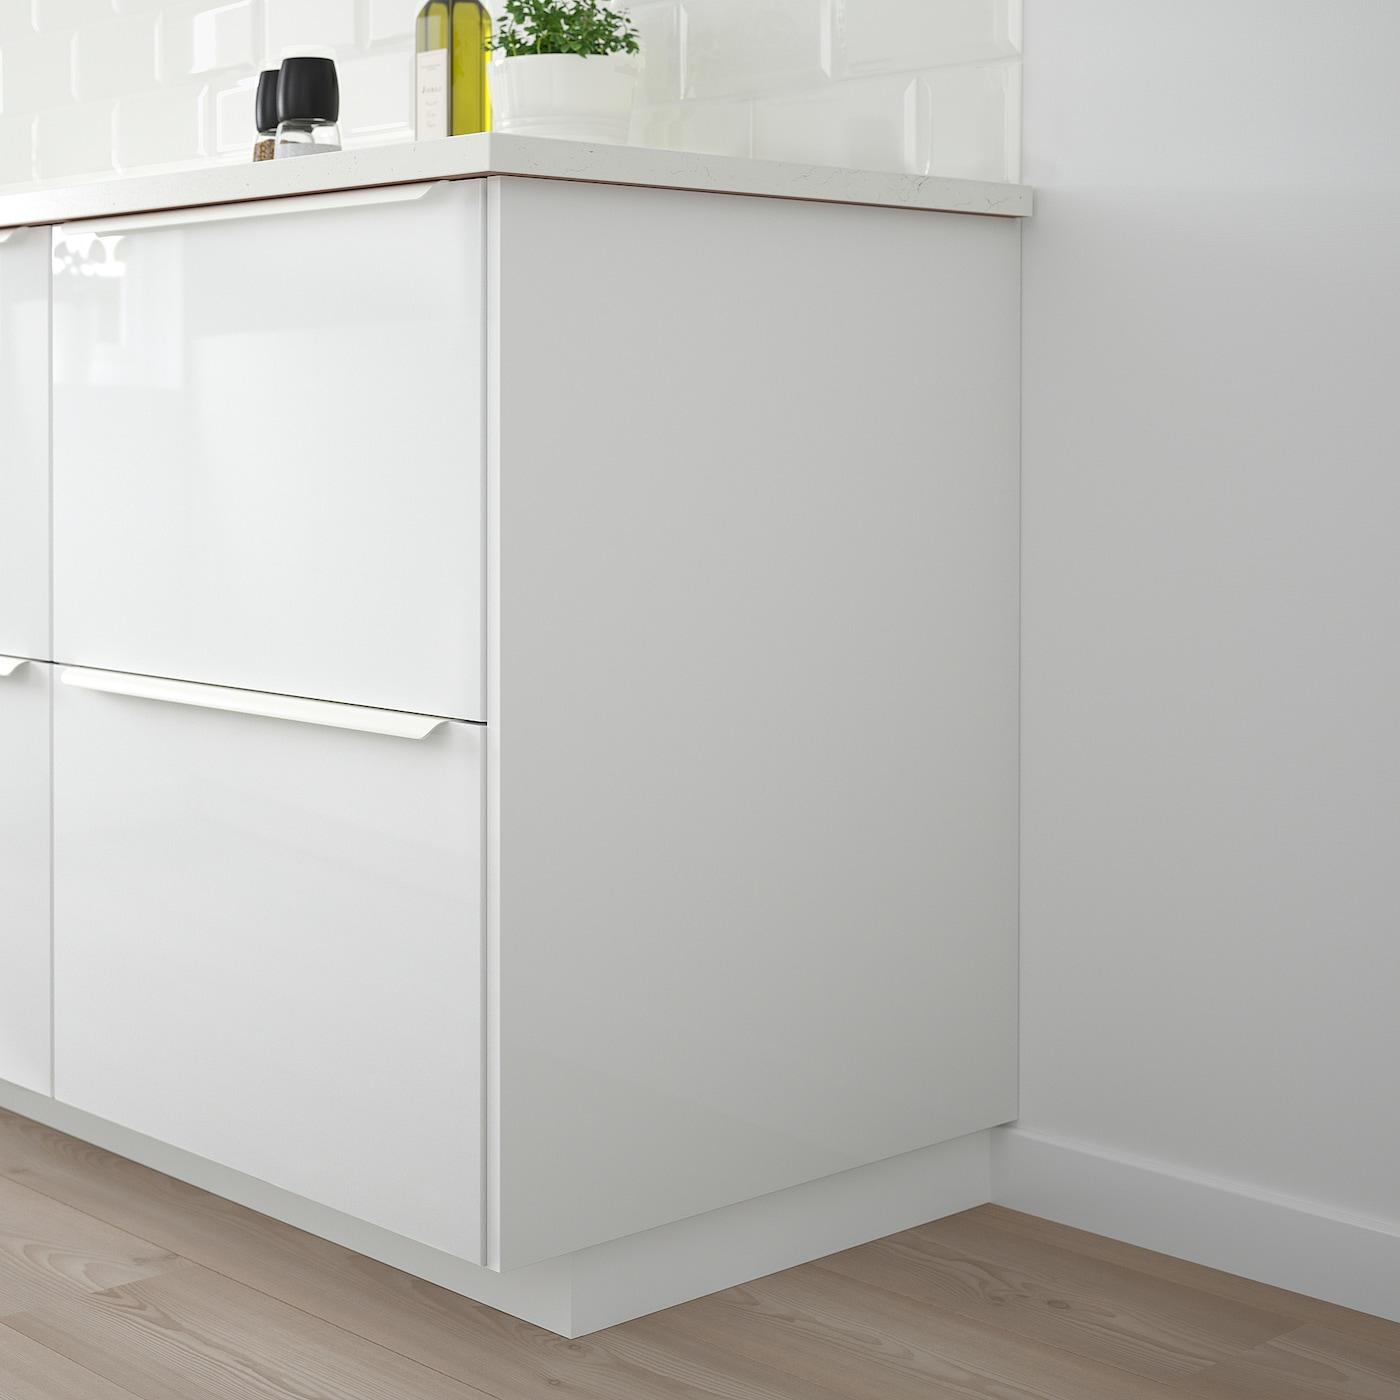 FÖrbÄttra Cover Panel High Gloss White